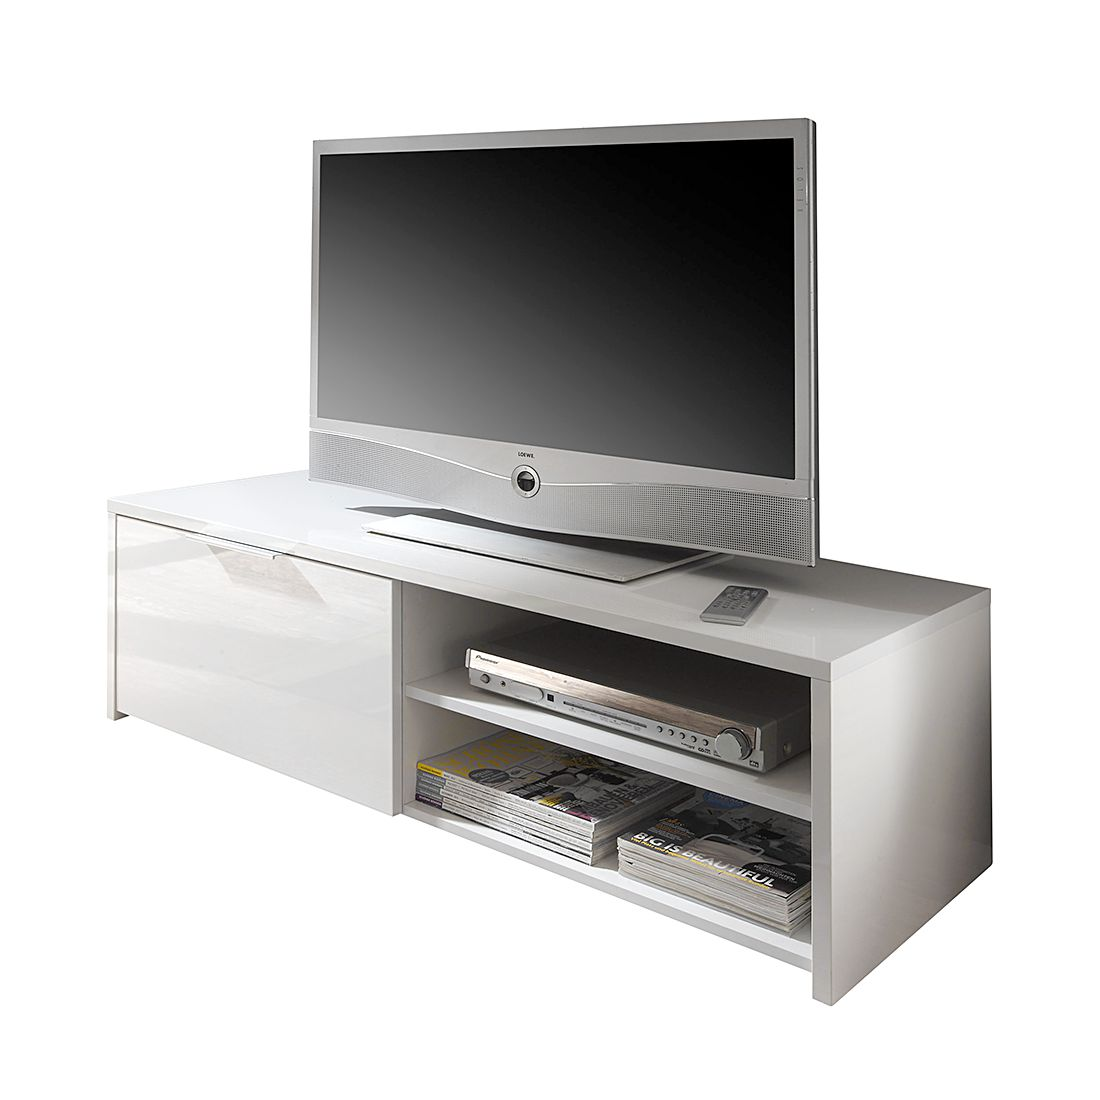 tv lowboard elianto hochglanz wei lc mobili bestellen. Black Bedroom Furniture Sets. Home Design Ideas